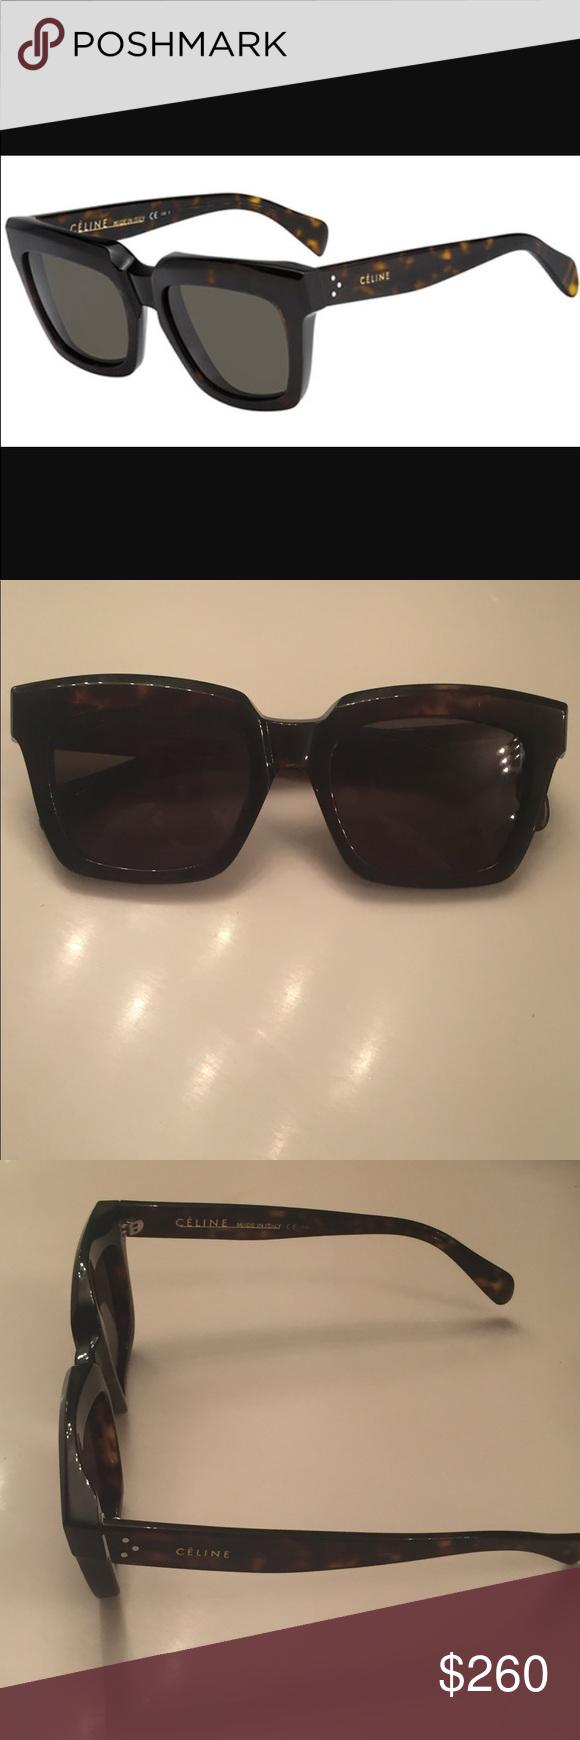 fd1084b51ae Celine sunglasses CELINE traveller sunglasses brown cl 41023 S. Like new!  No case included( sorry 😢) Celine Accessories Sunglasses